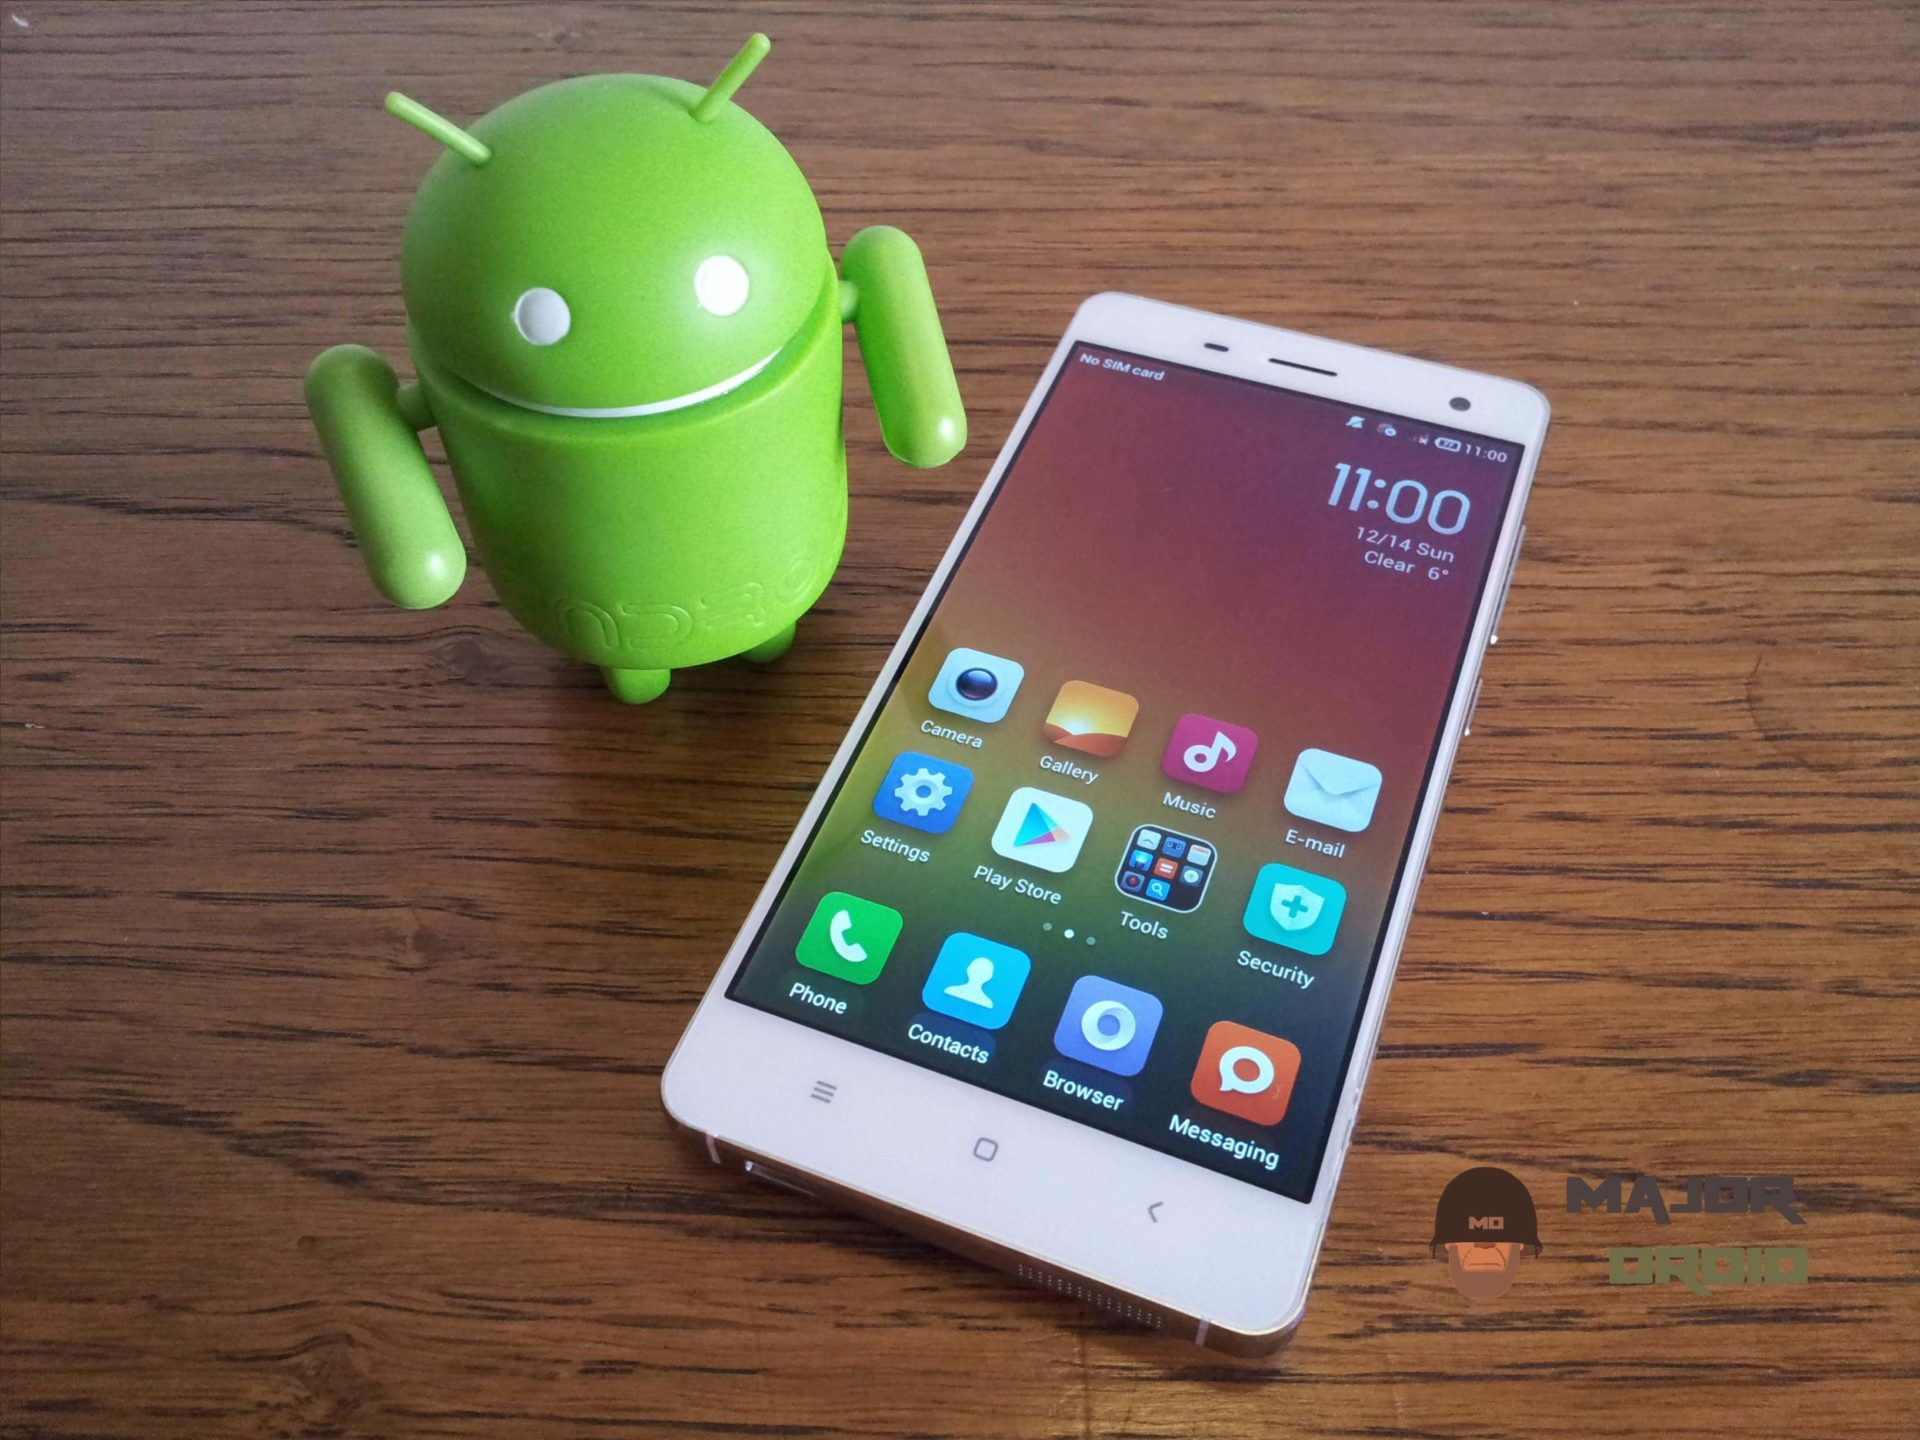 No1 Mi4 Xiaomi Mi 4 Clone Review